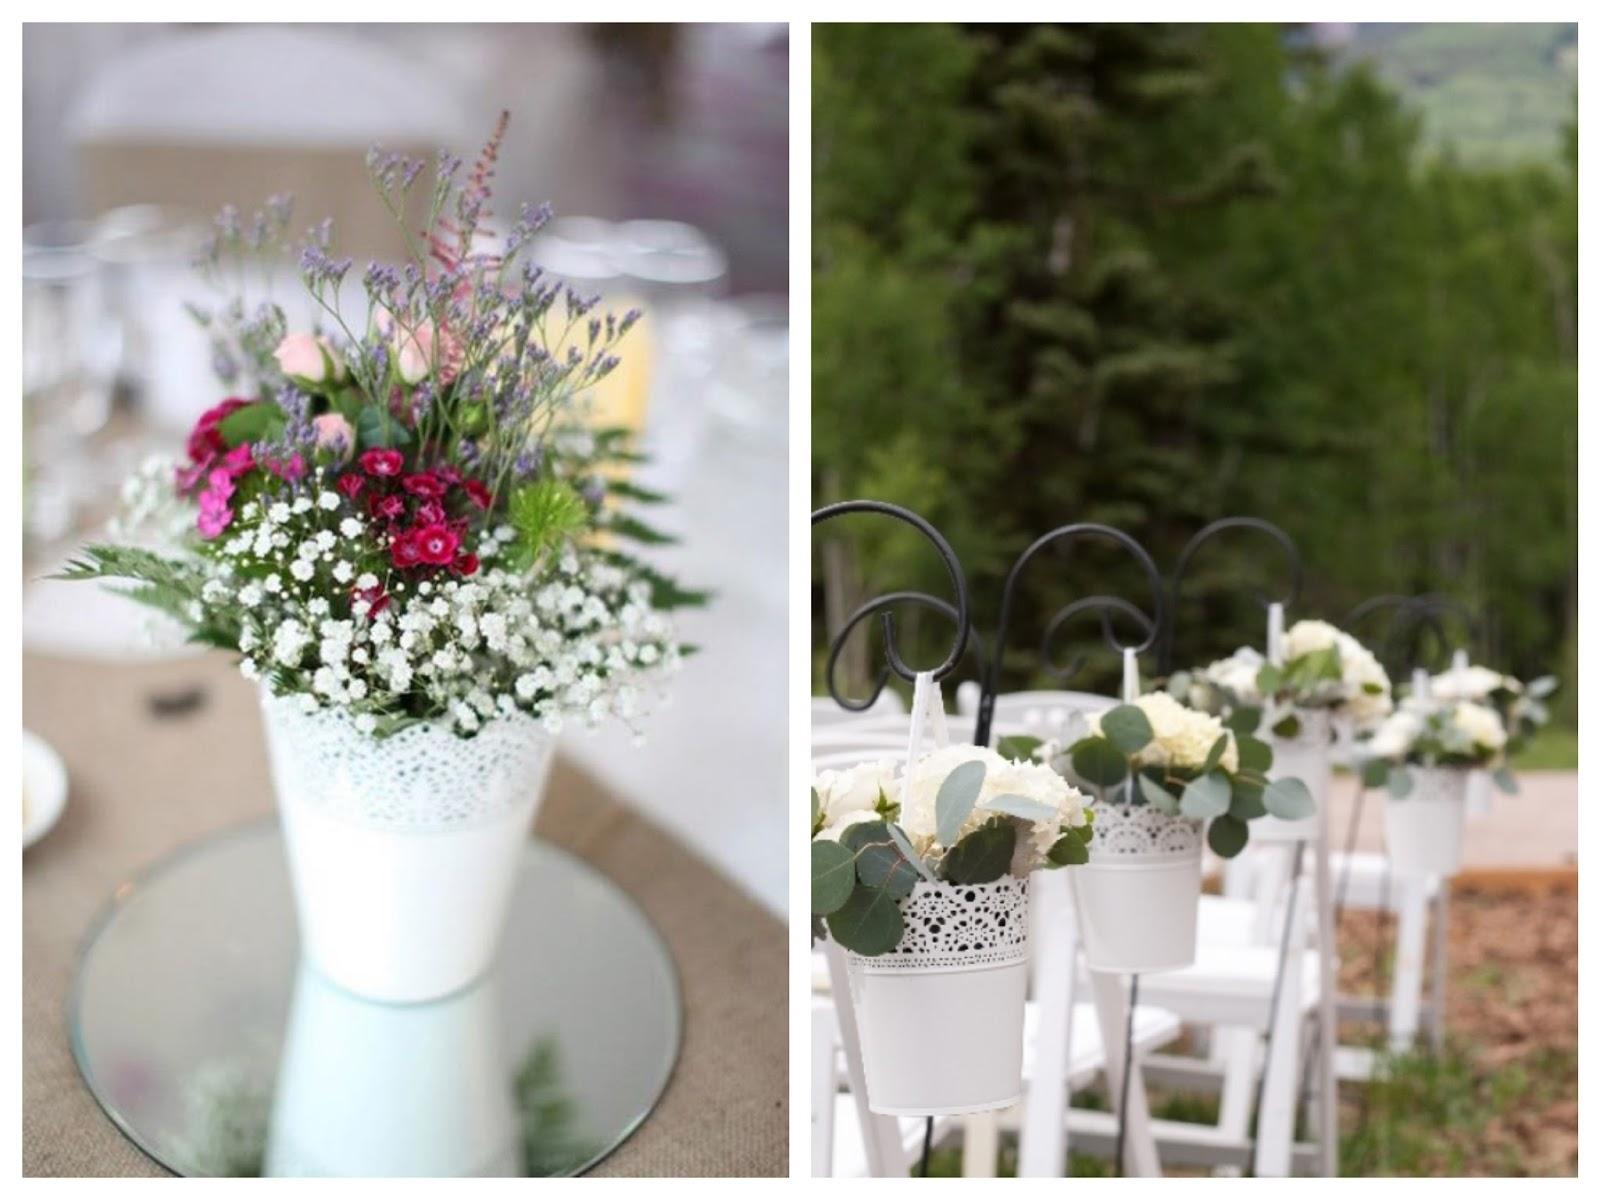 Decora tu boda con b sicos de ikea sweet bodas for Jaulas decoracion ikea